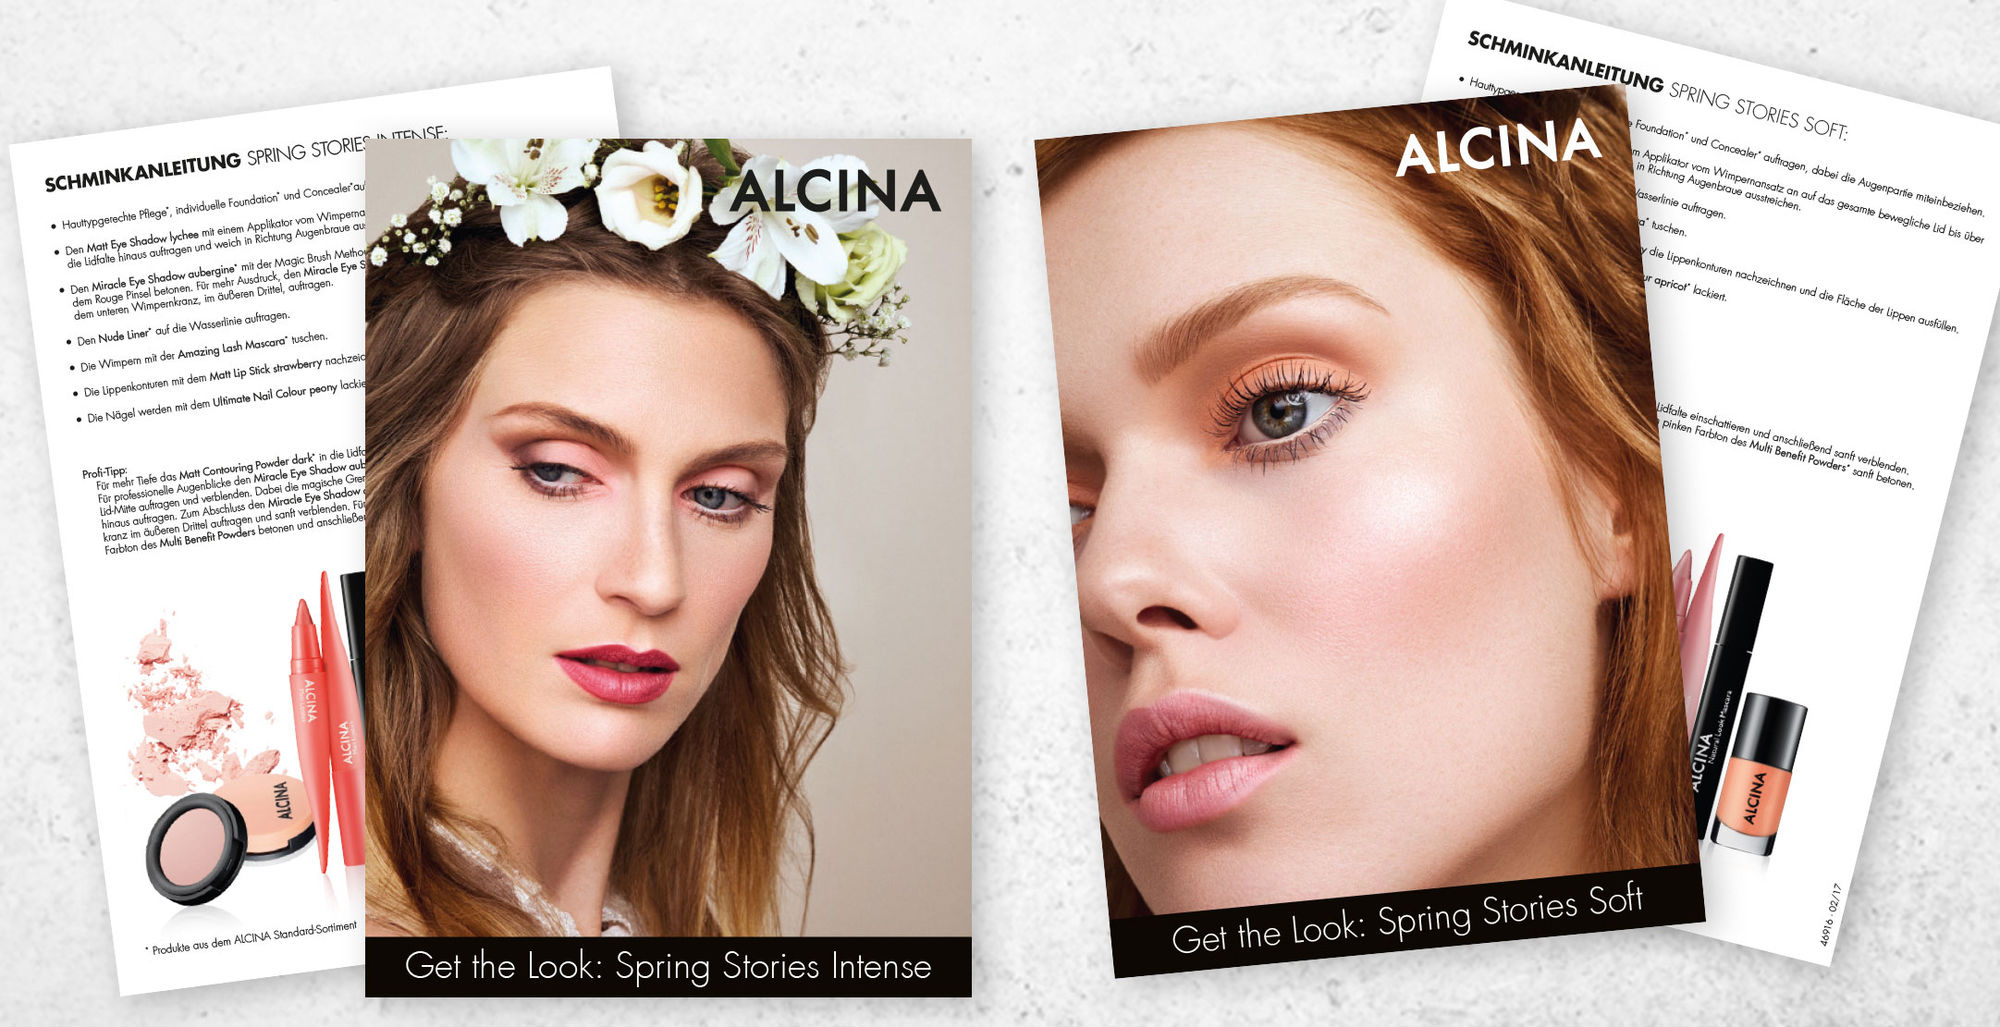 PHILIPP SEINE HELDEN for ALCINA 'Spring Stories'